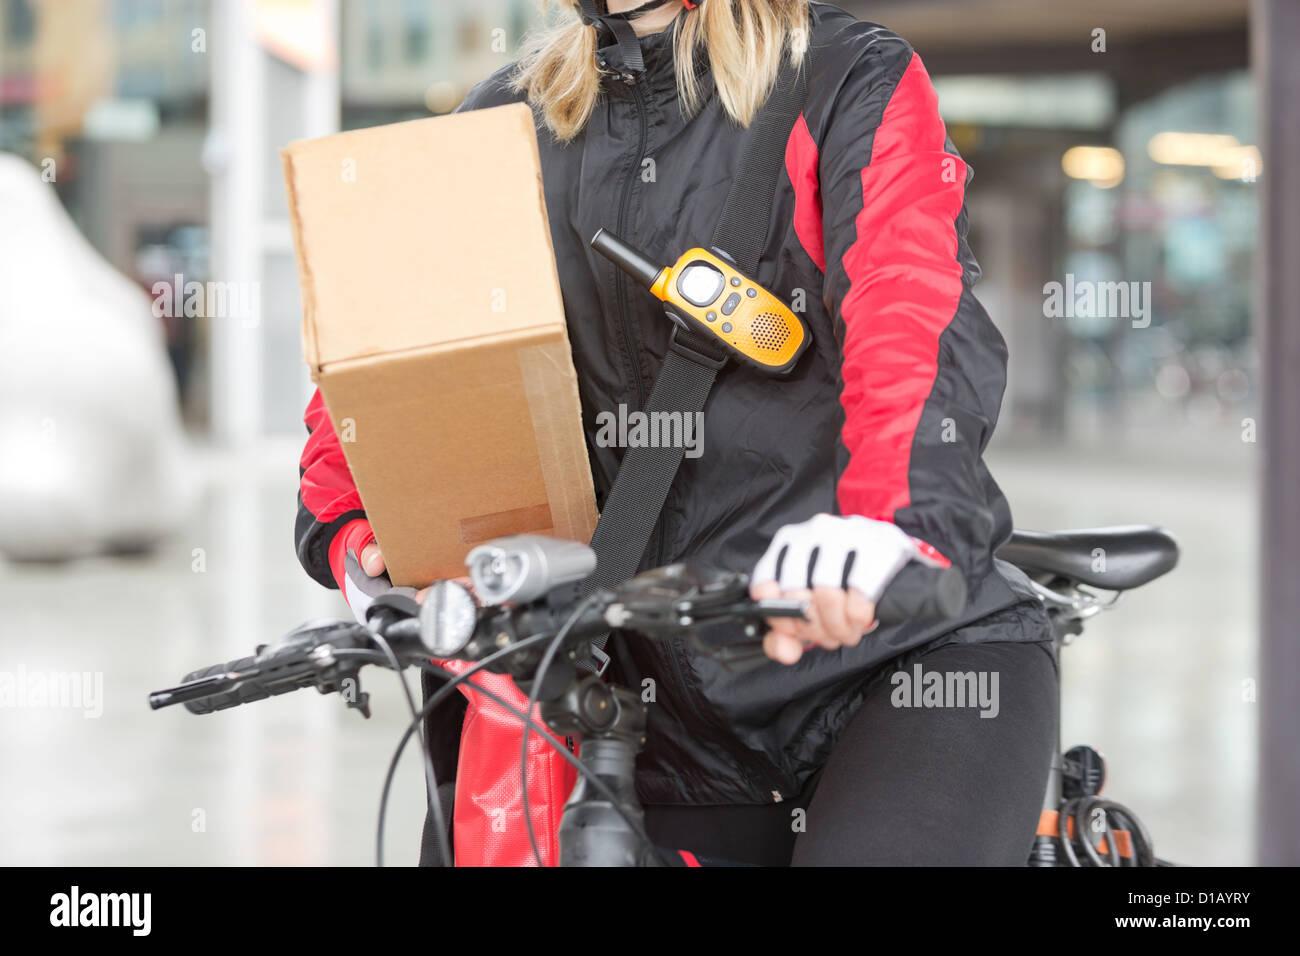 Cycliste féminine avec boîte en carton et Courier Bag On Street Photo Stock